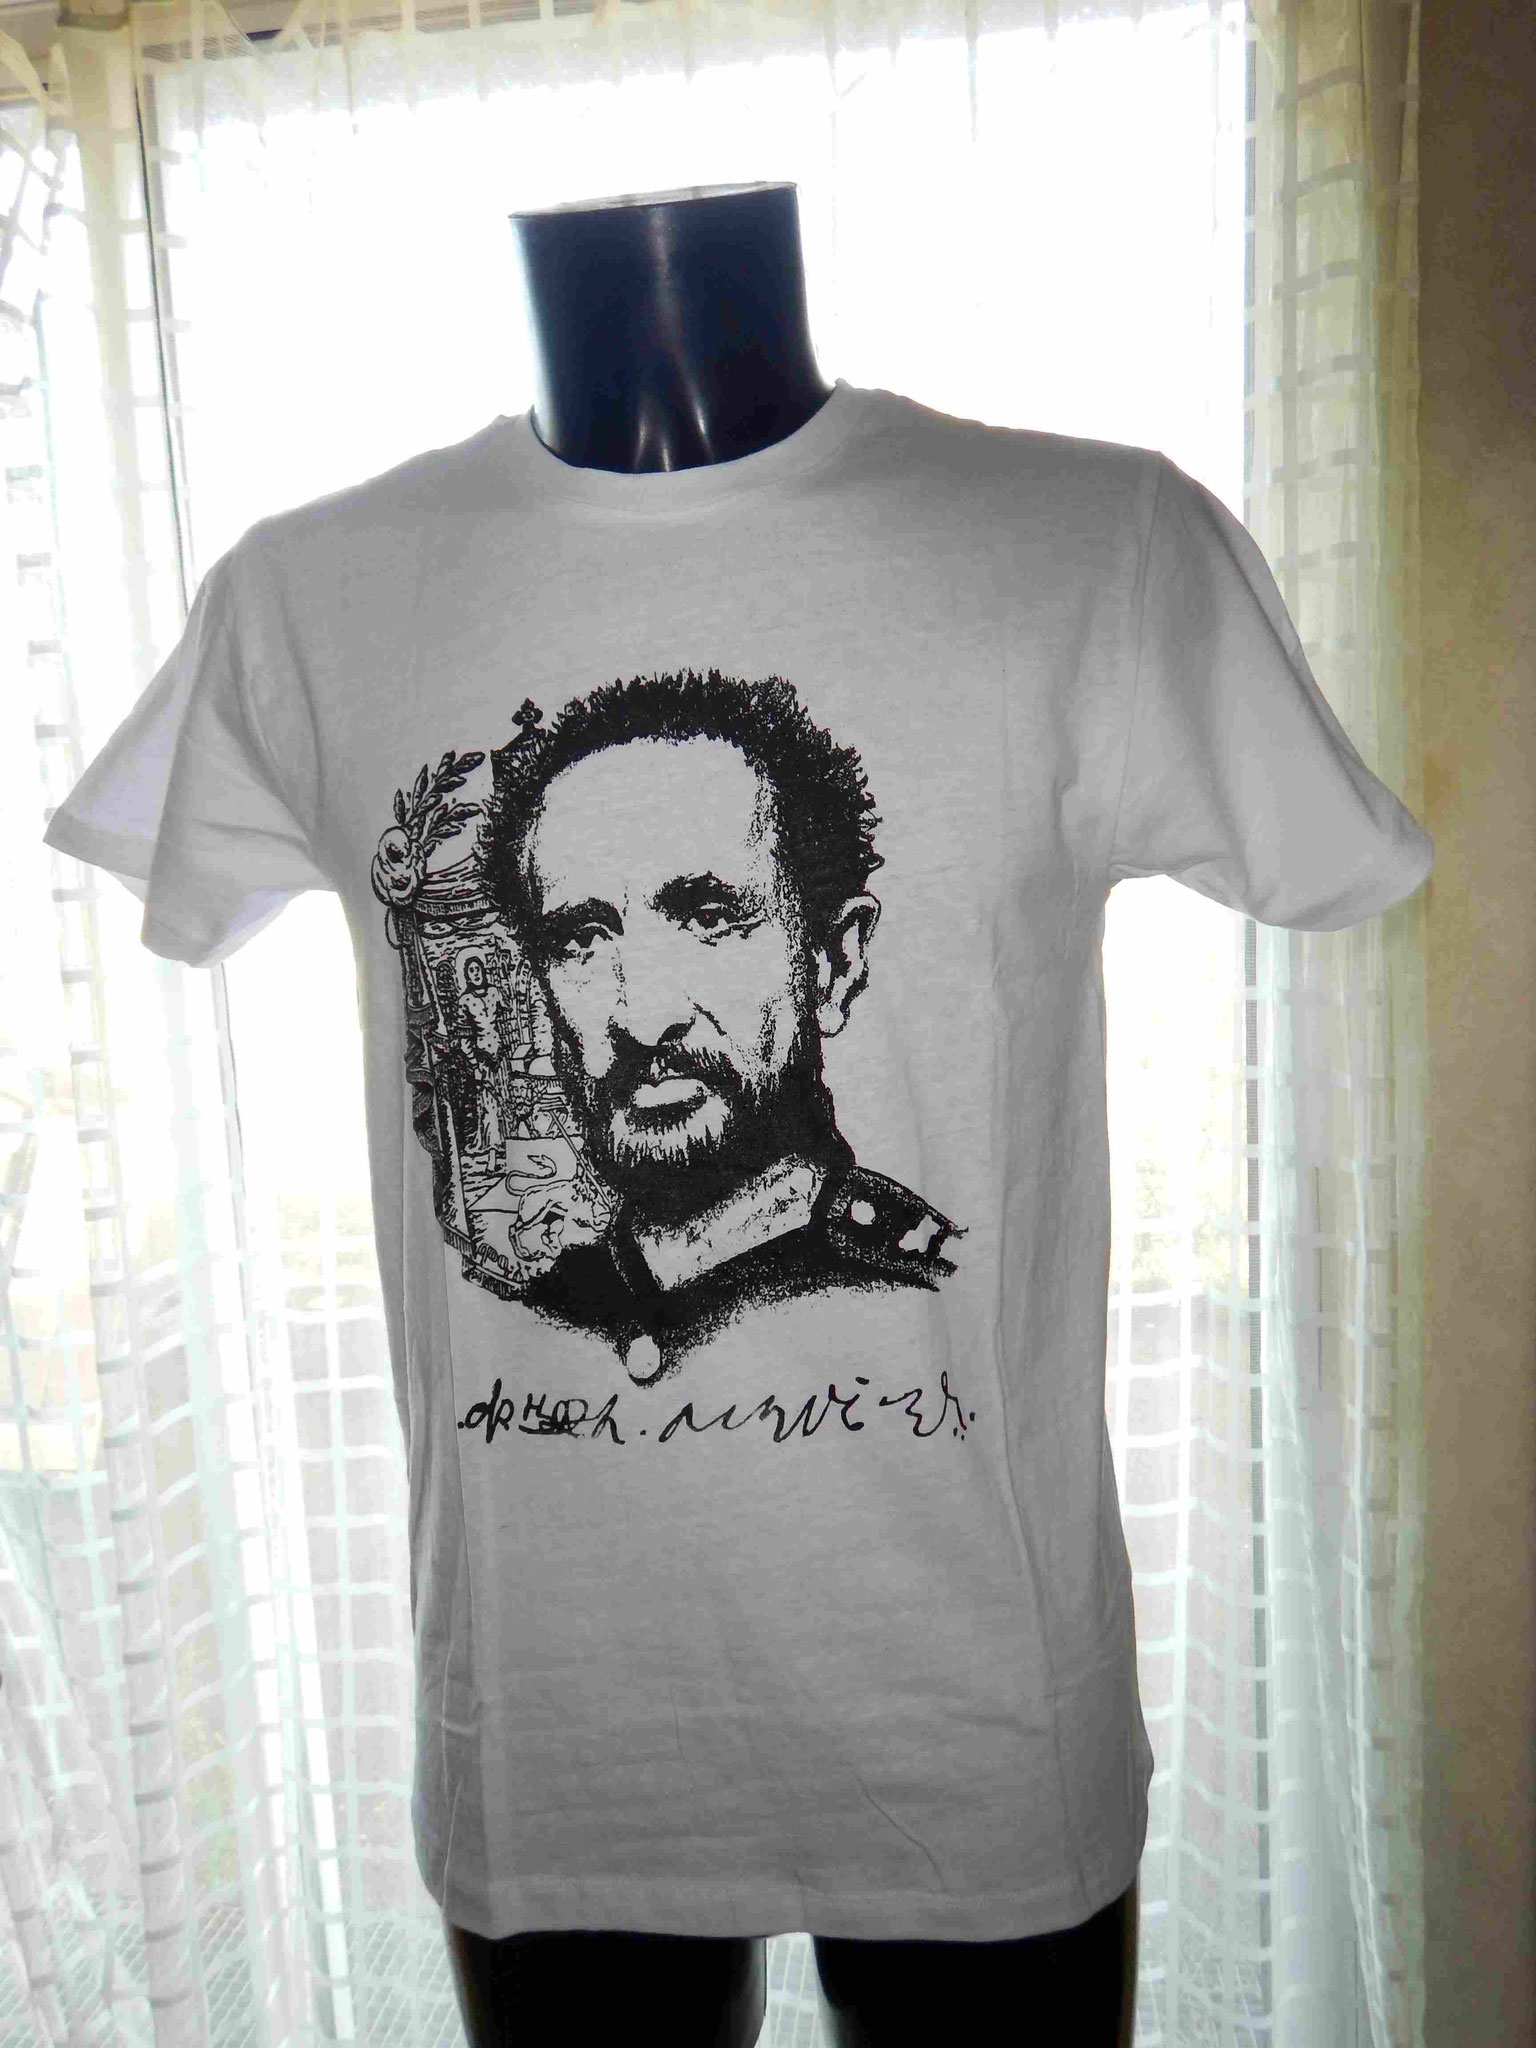 T-Shirt Haie Selassie Rasta Ras Tafari Robe Habesha Coton Ethiopie Artisanat ethiopien Epices made by locals solidaire équitable textils voyage Ethiopie 1